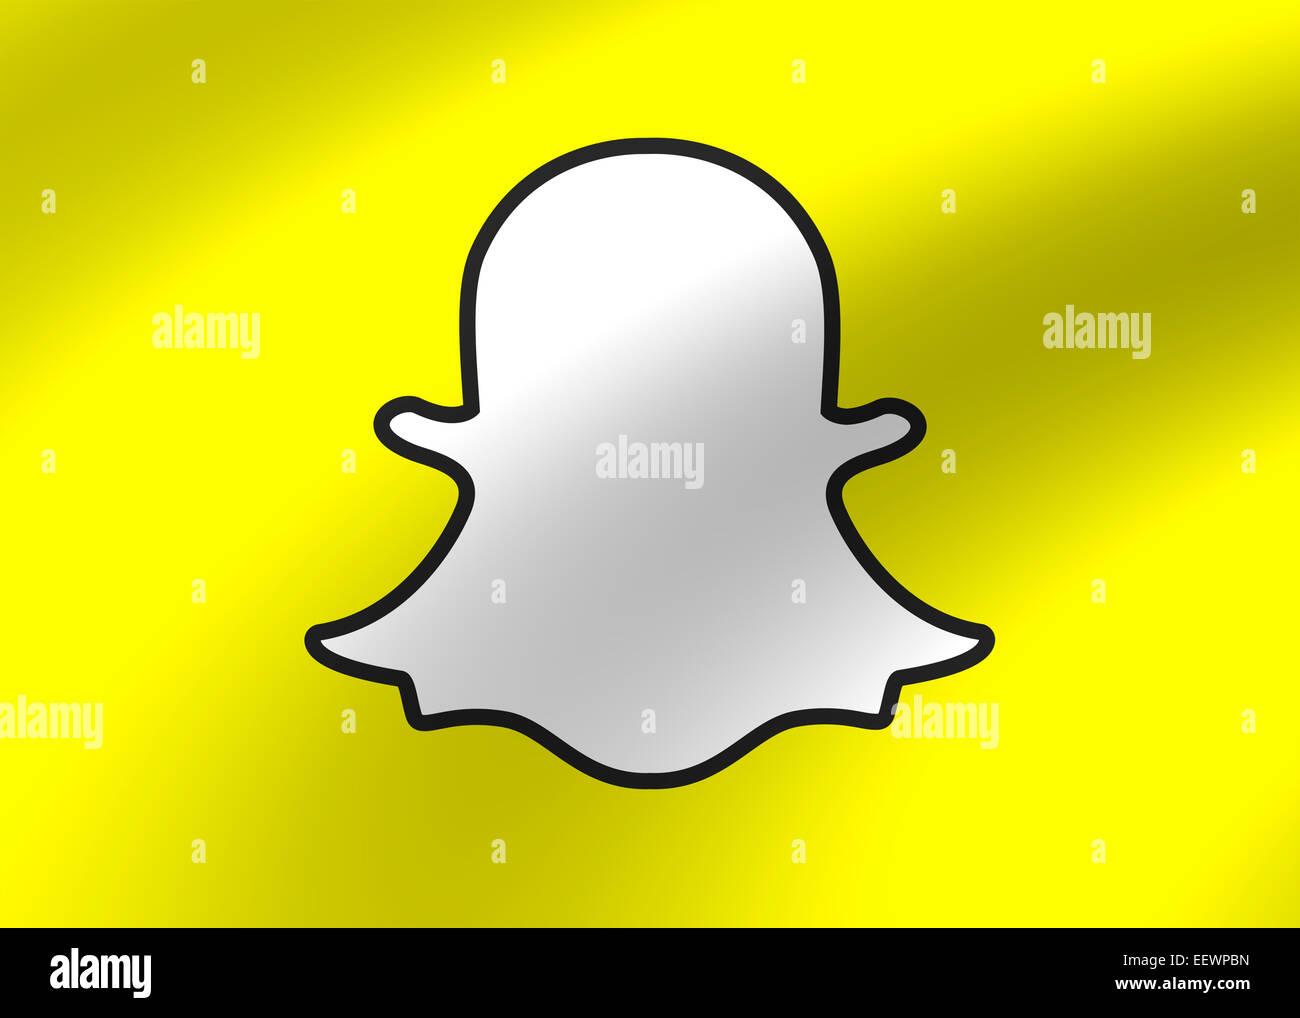 Snapchat logo icon symbol emblem - Stock Image